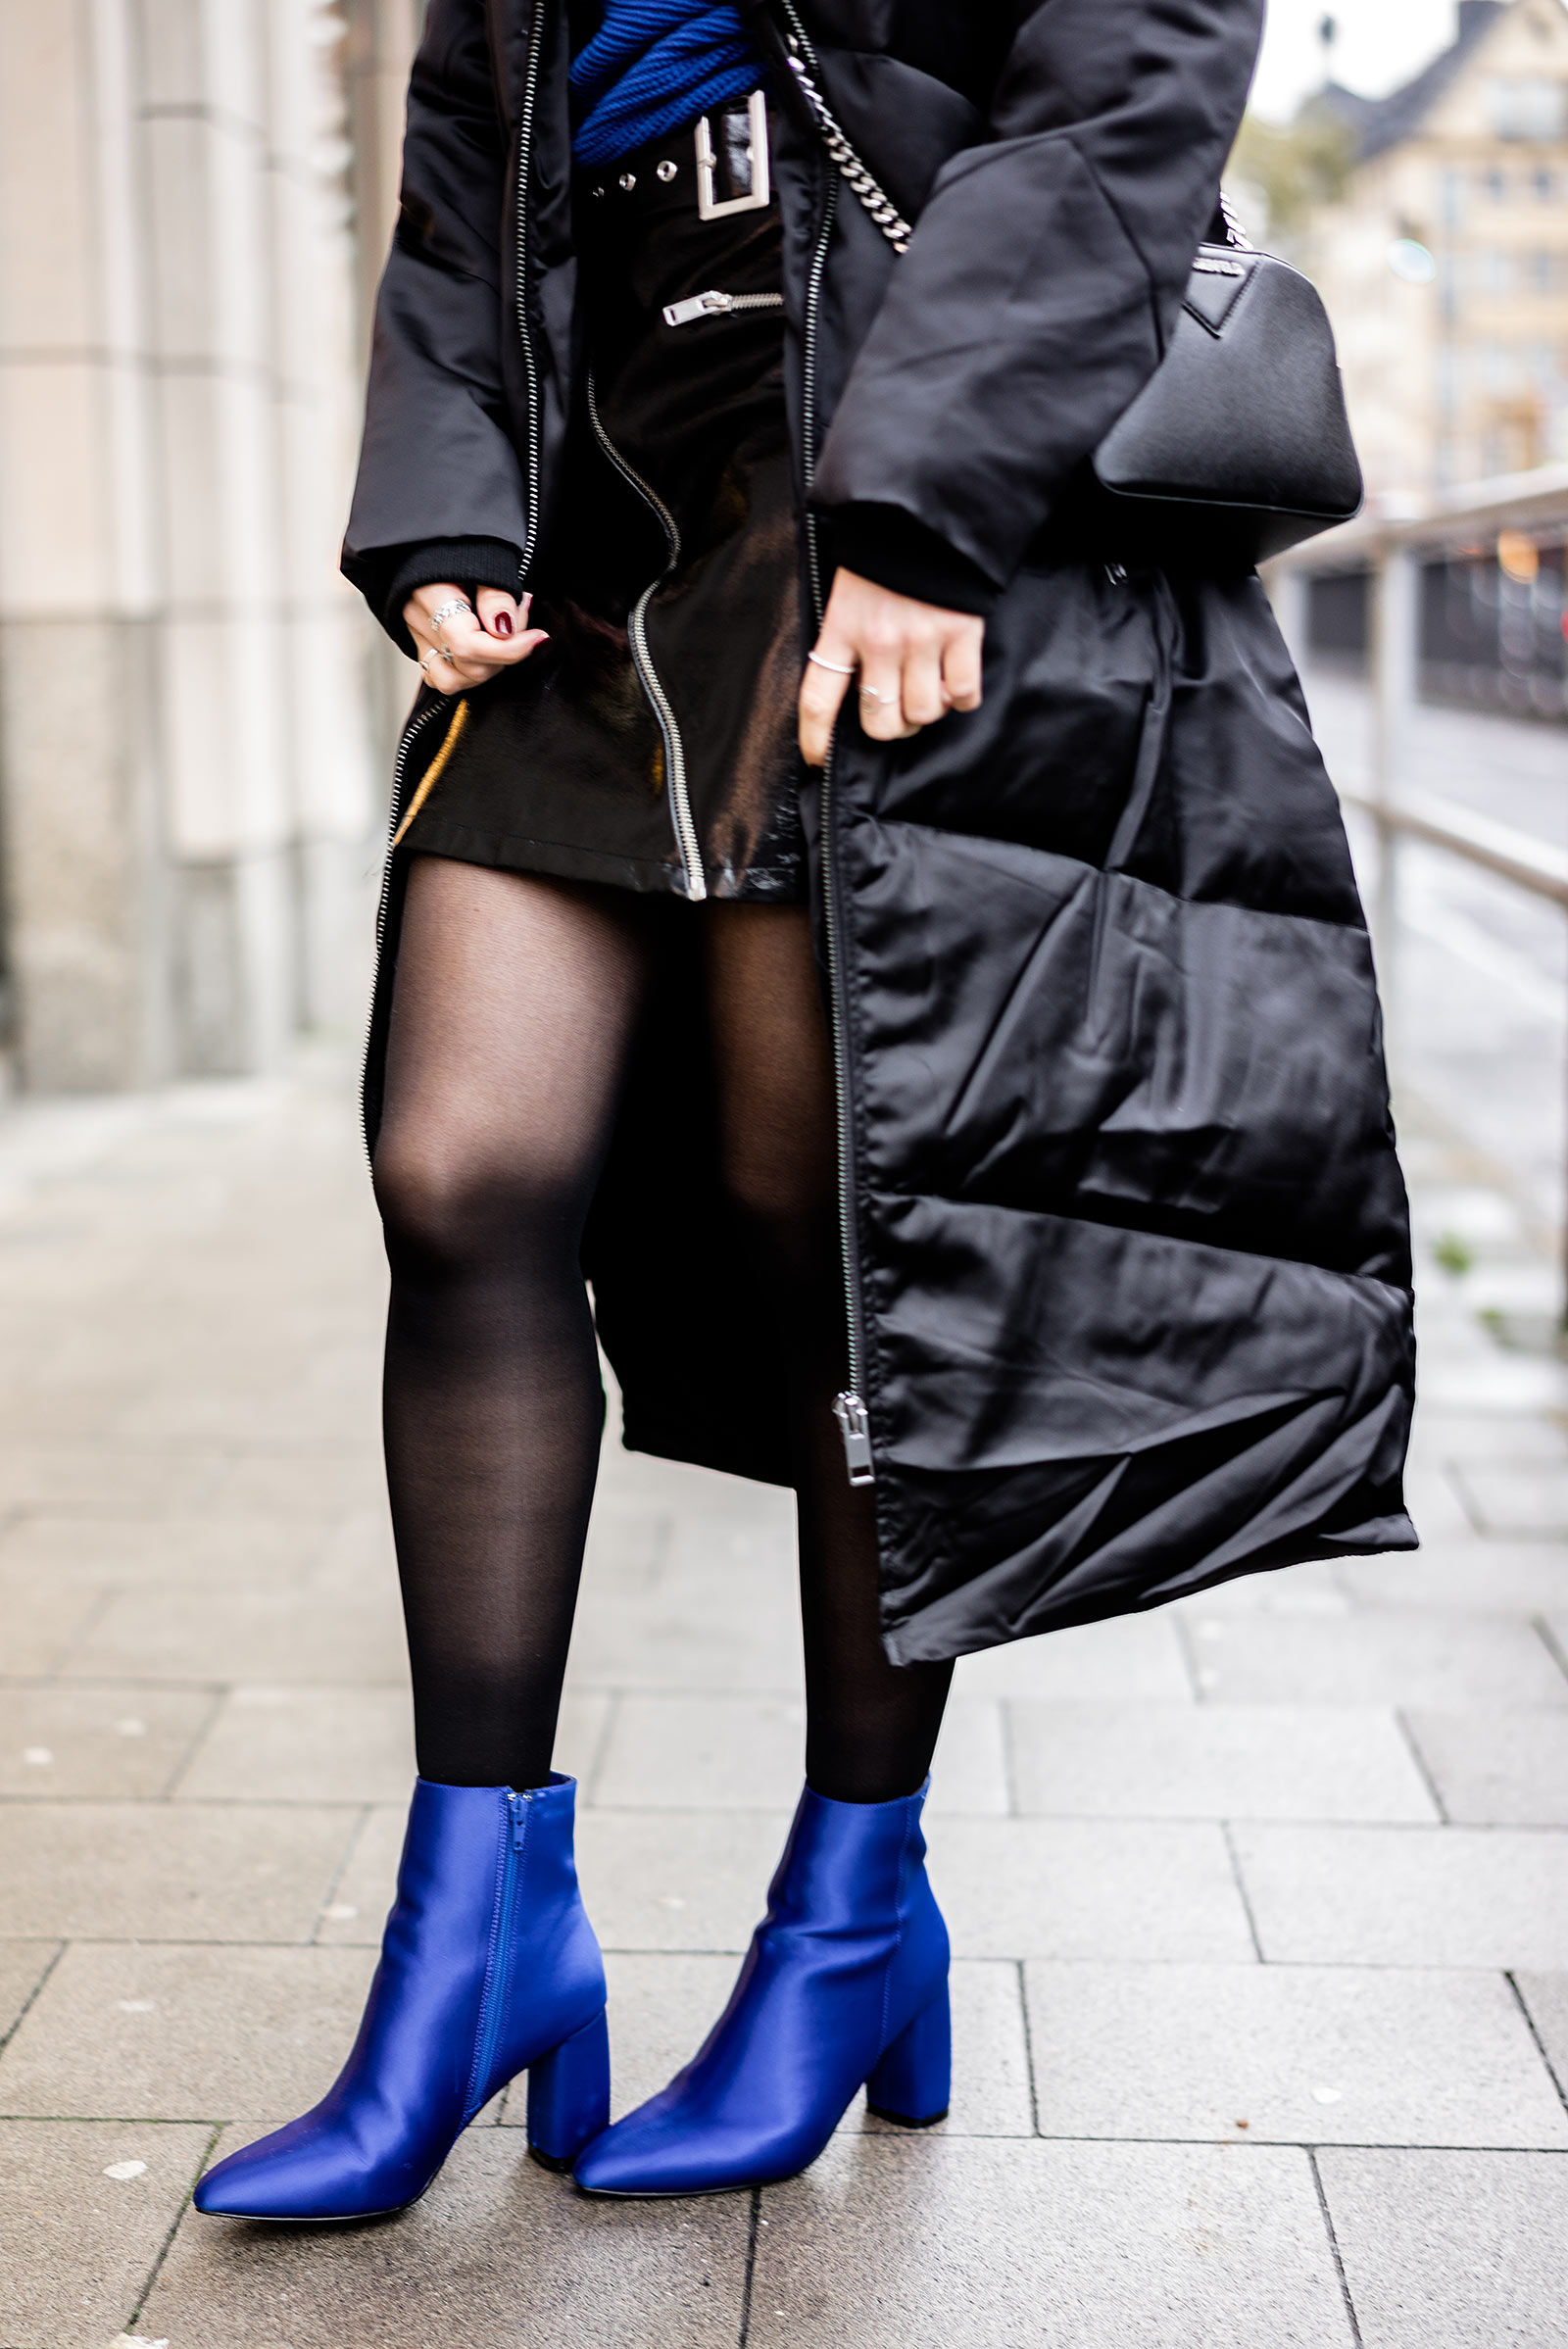 nakd Boots blau Outfit Lederrock Winter Sunnyinga Bloggerin